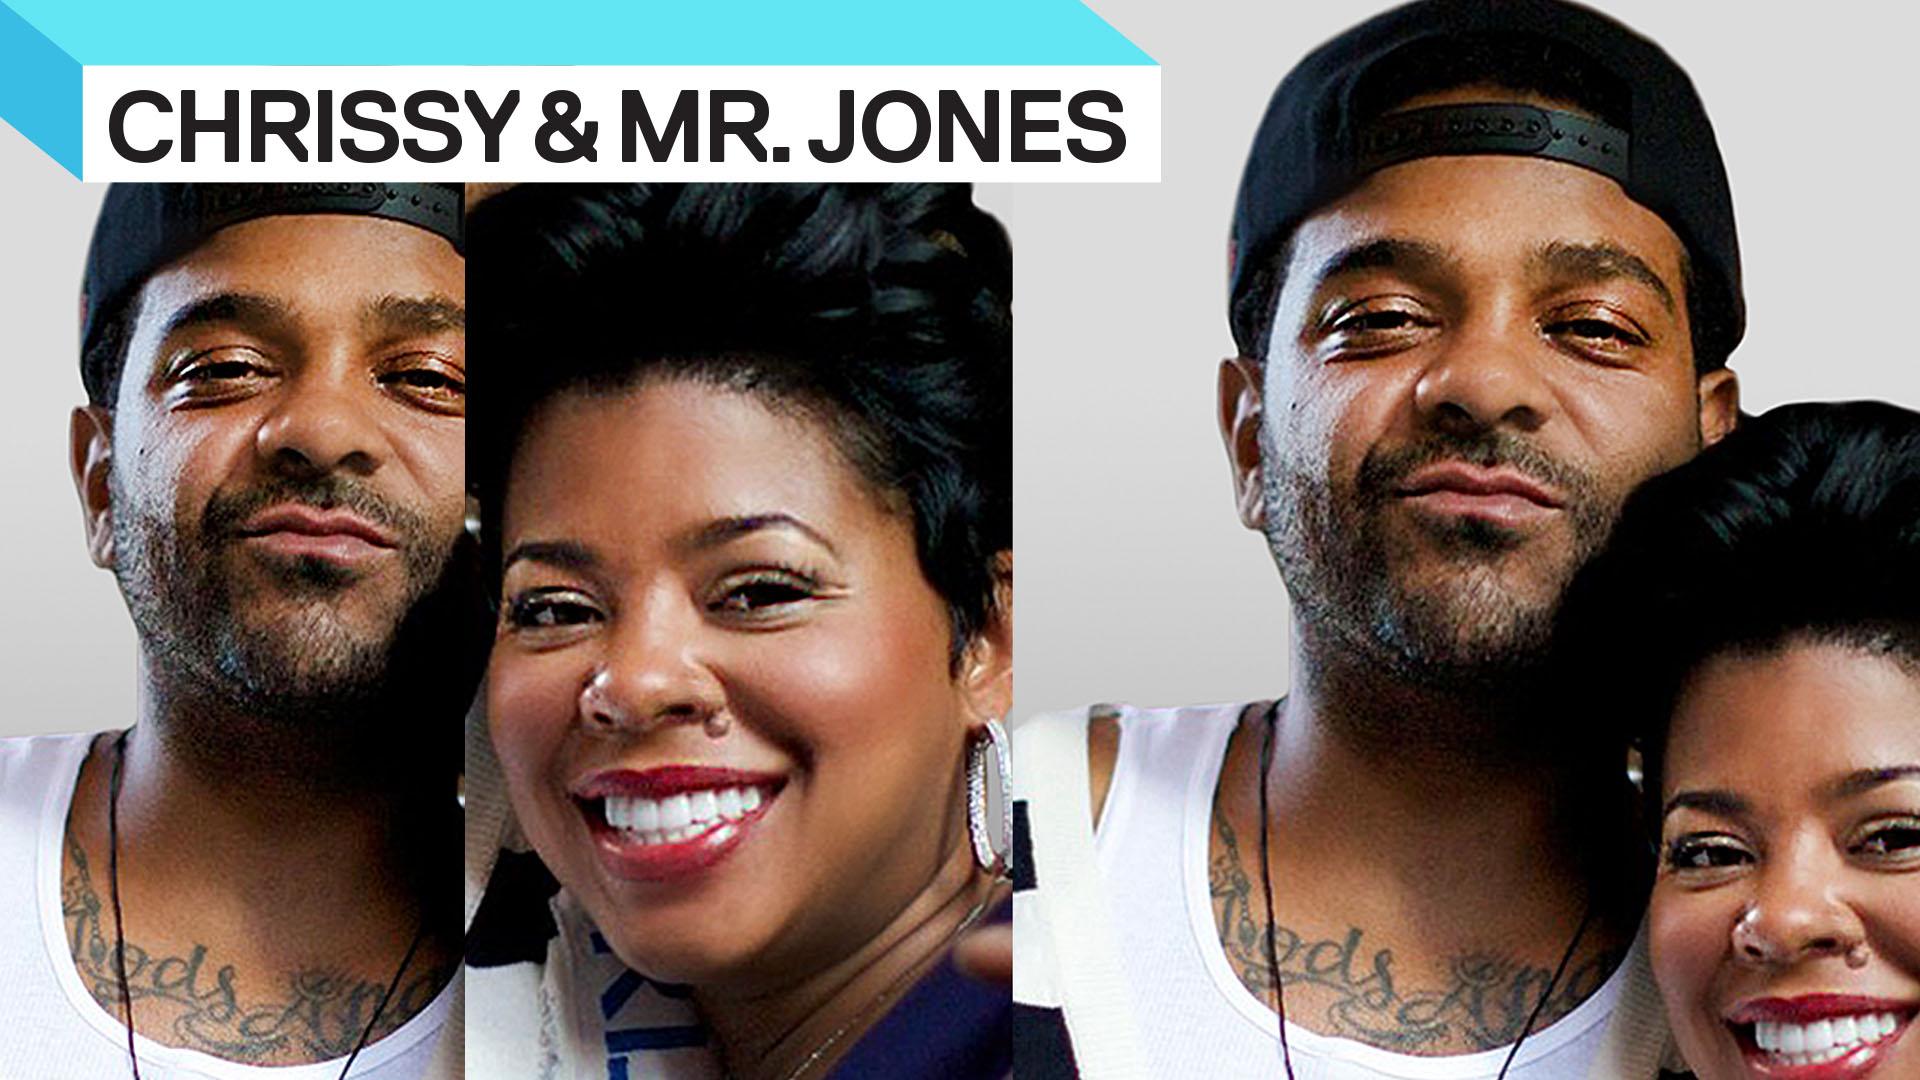 Chrissy & Mr. Jones Season 1